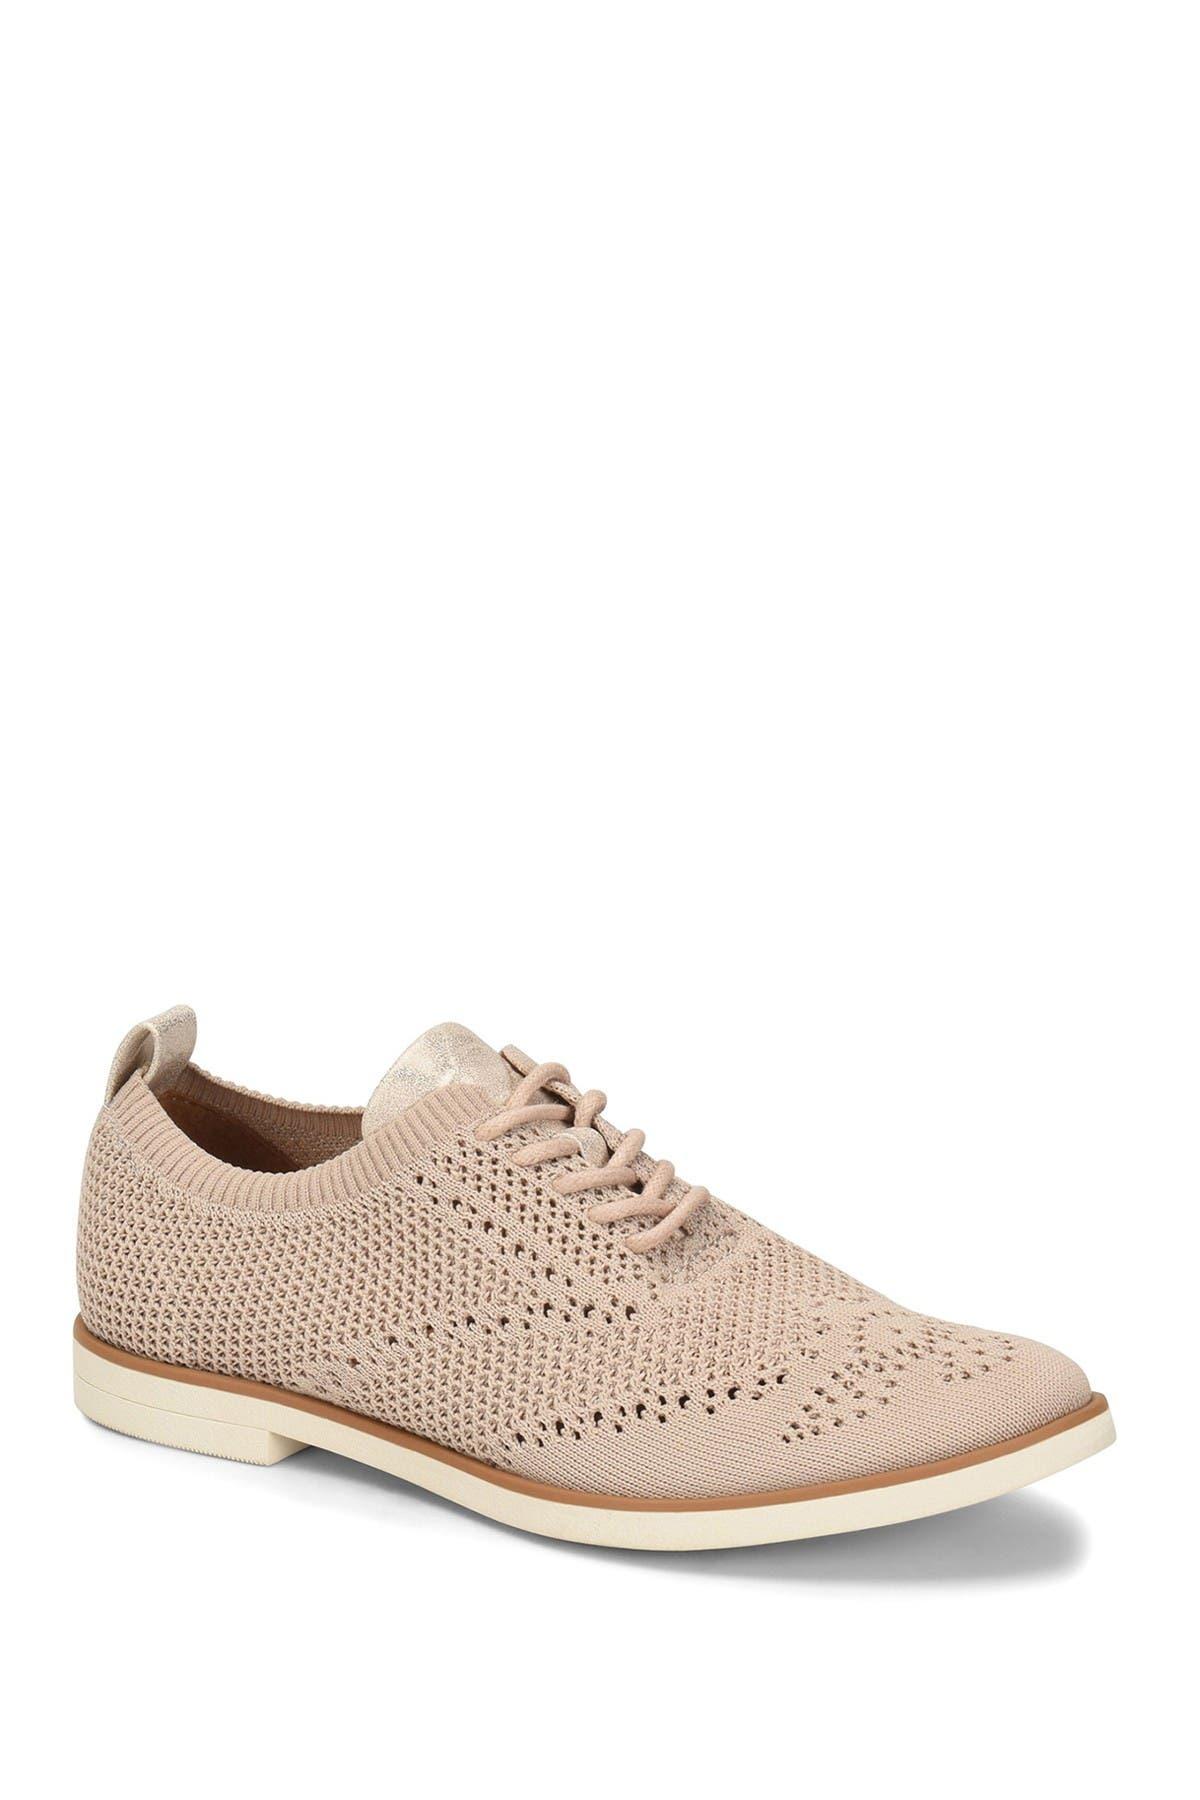 Image of EUROSOFT Virida Perforated Knit Oxford Sneaker